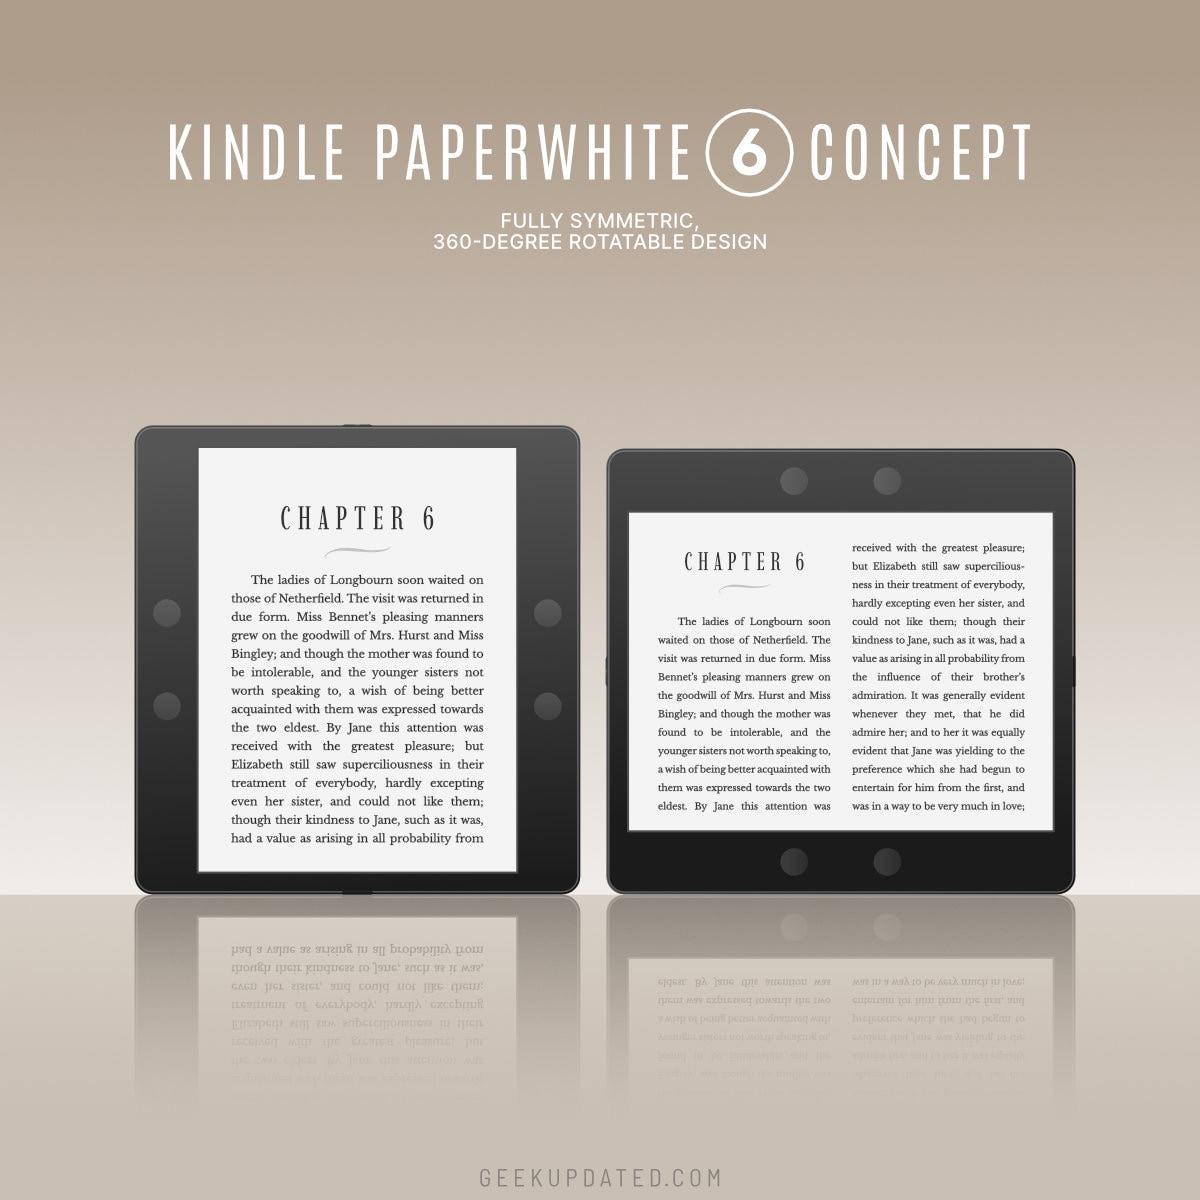 Kindle Paperwhite 6 concept - vertical vs horizontal